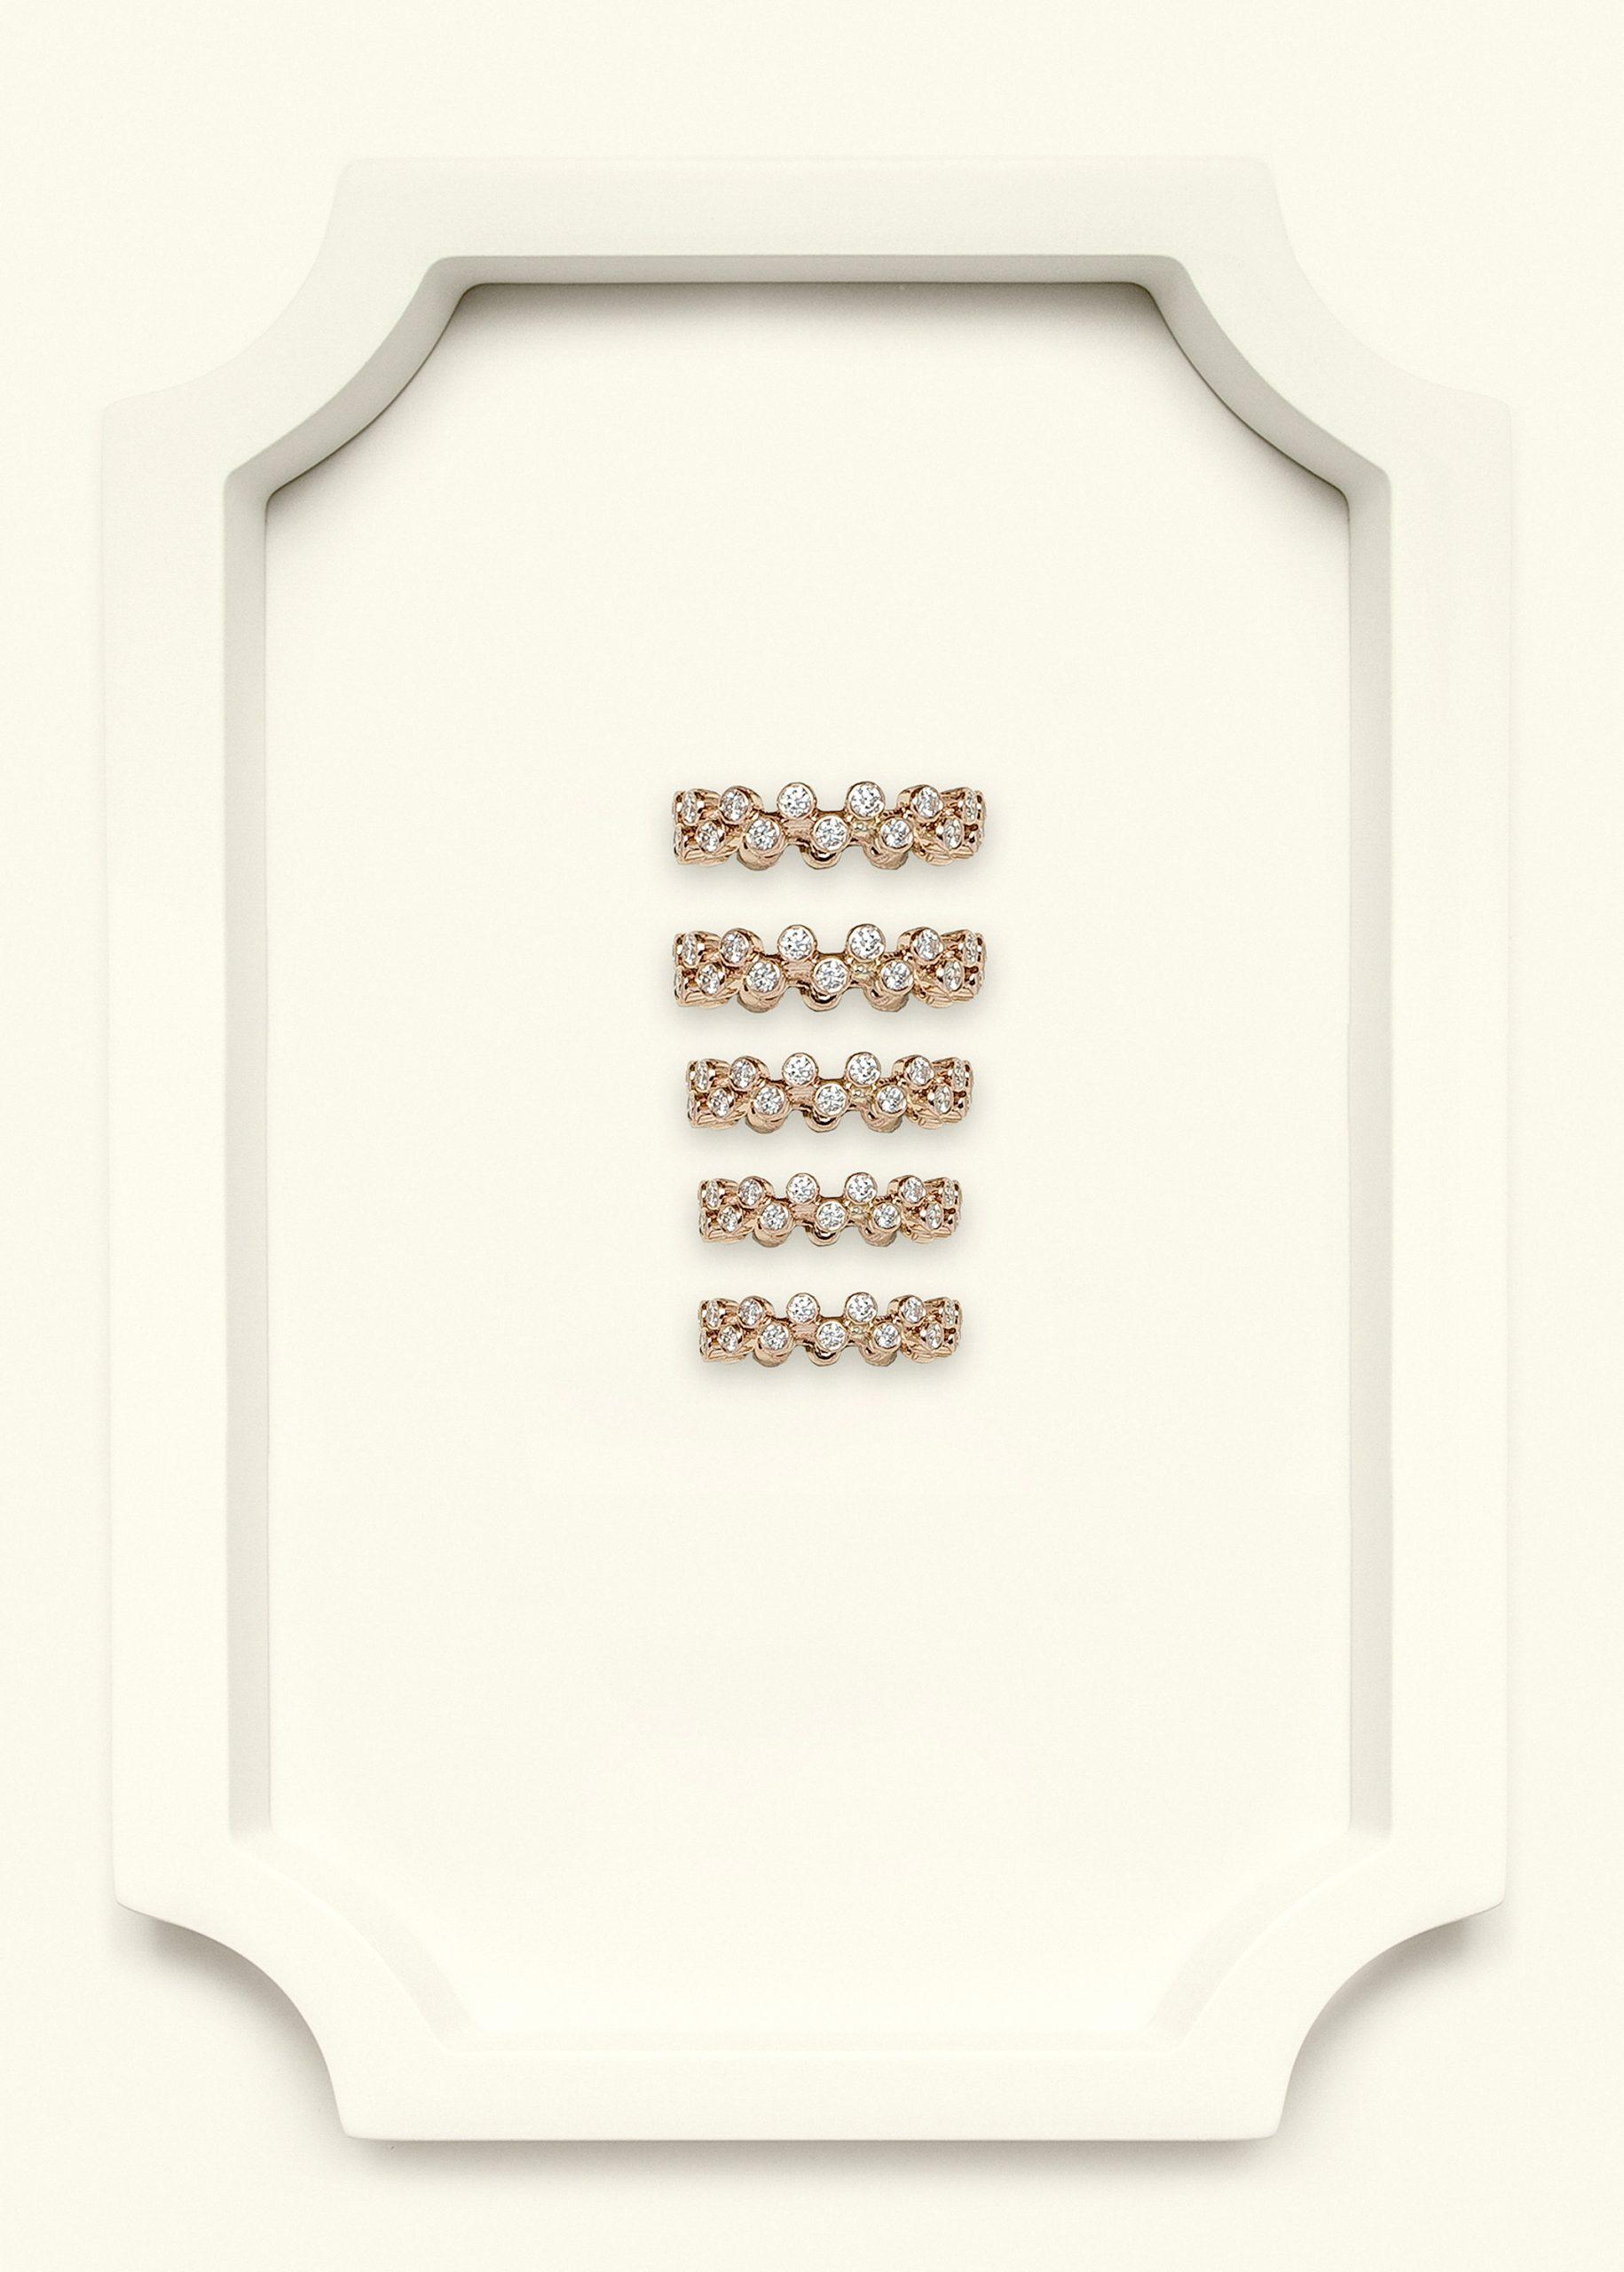 Full Diamond Rose Gold Stackable Ring